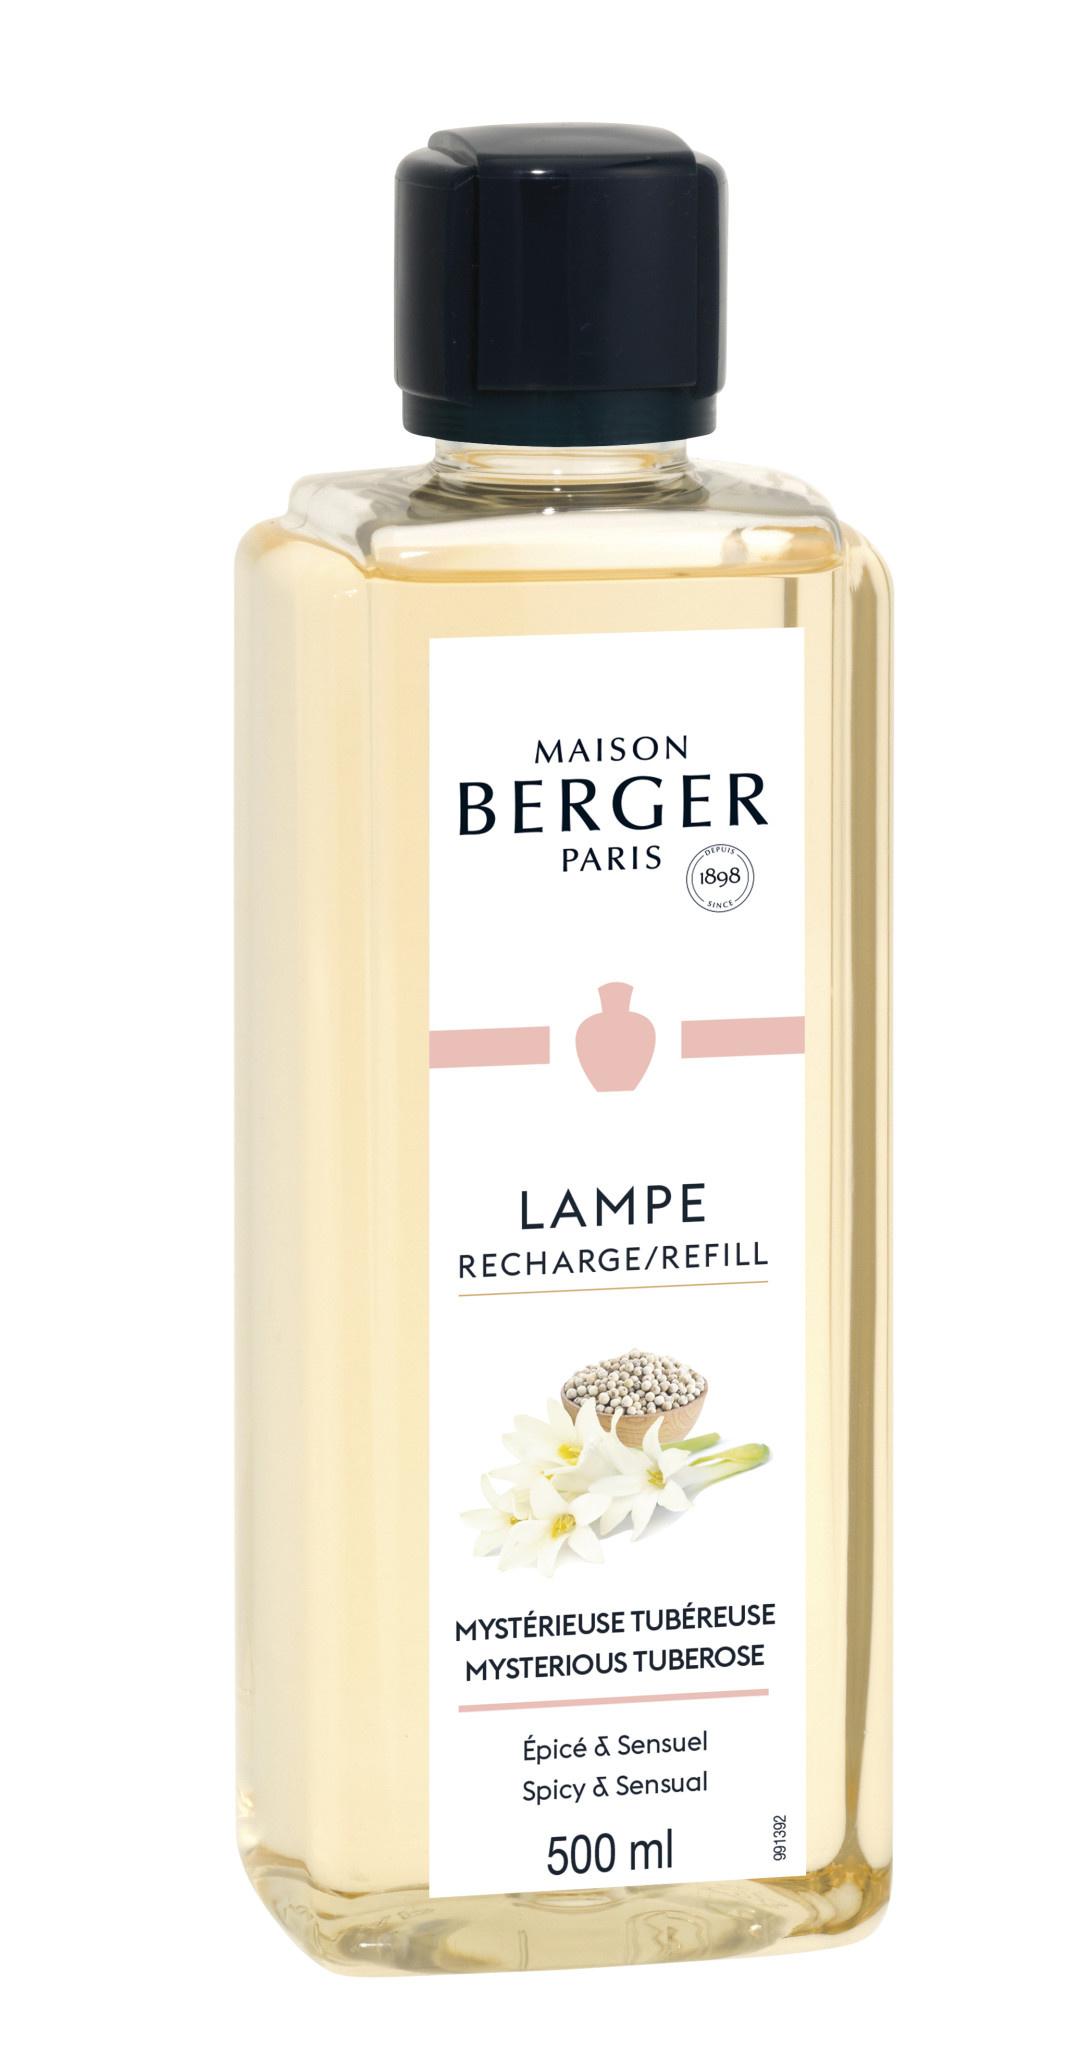 Maison Berger Mysterious Tuberose 500 ml